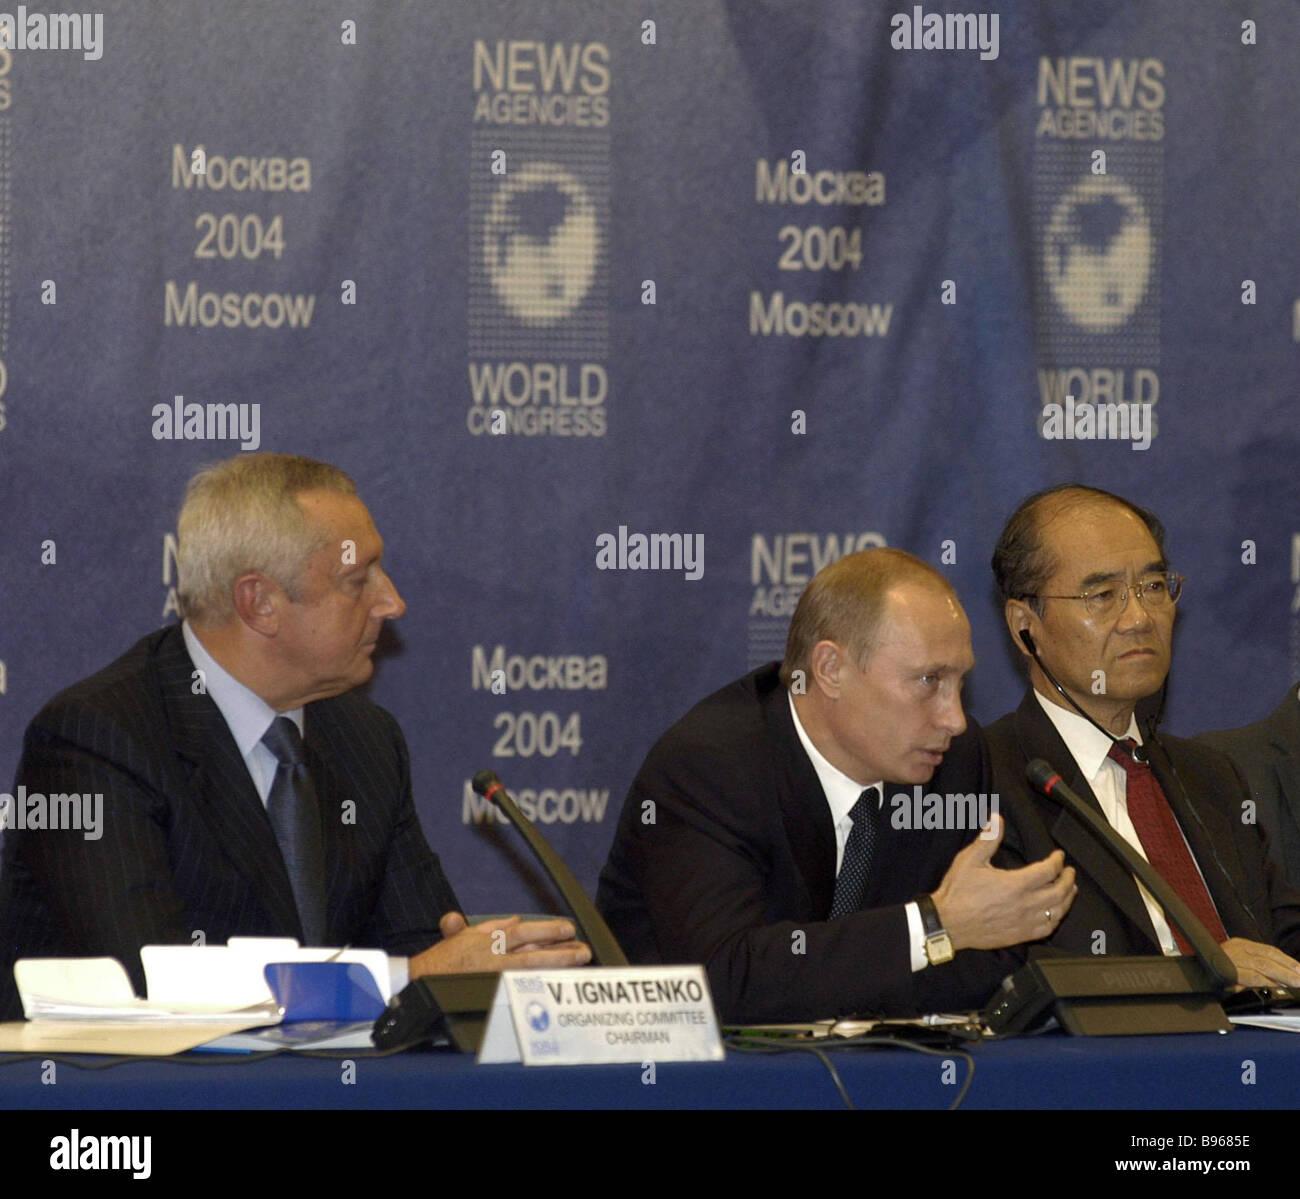 Russian President Vladimir Putin center UNESCO Director General Koichiro Matsuura right and ITAR TASS General Director - Stock Image